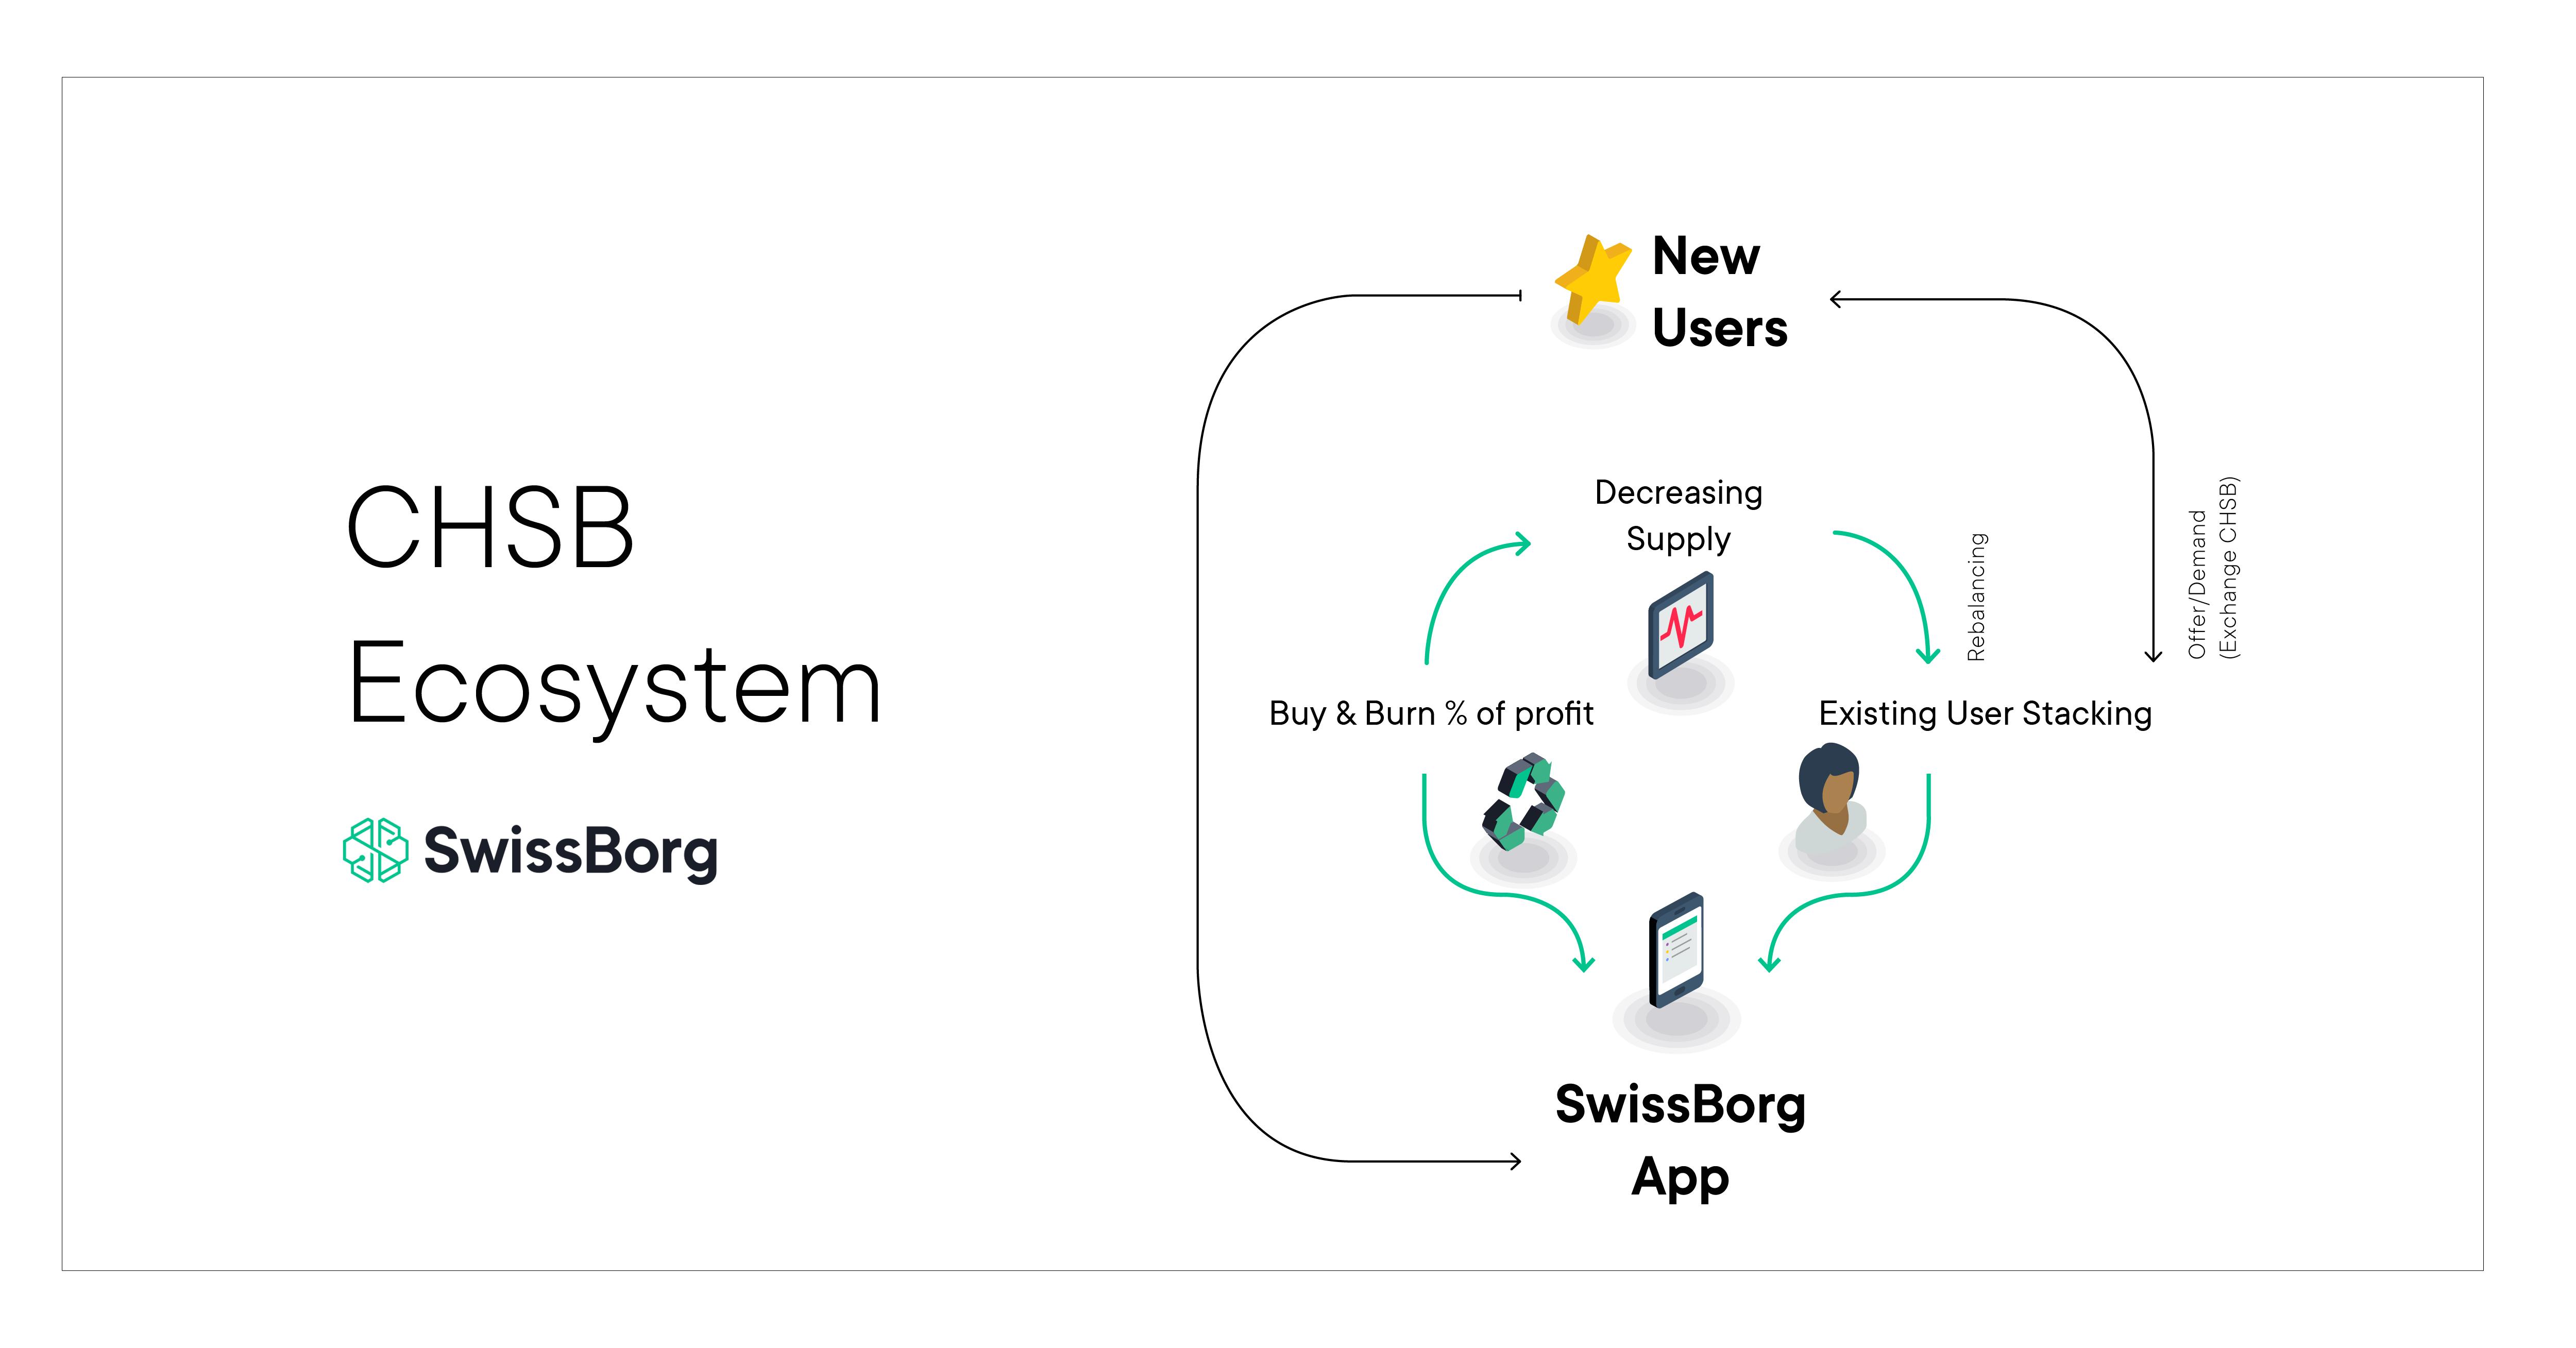 chsb ecosystem